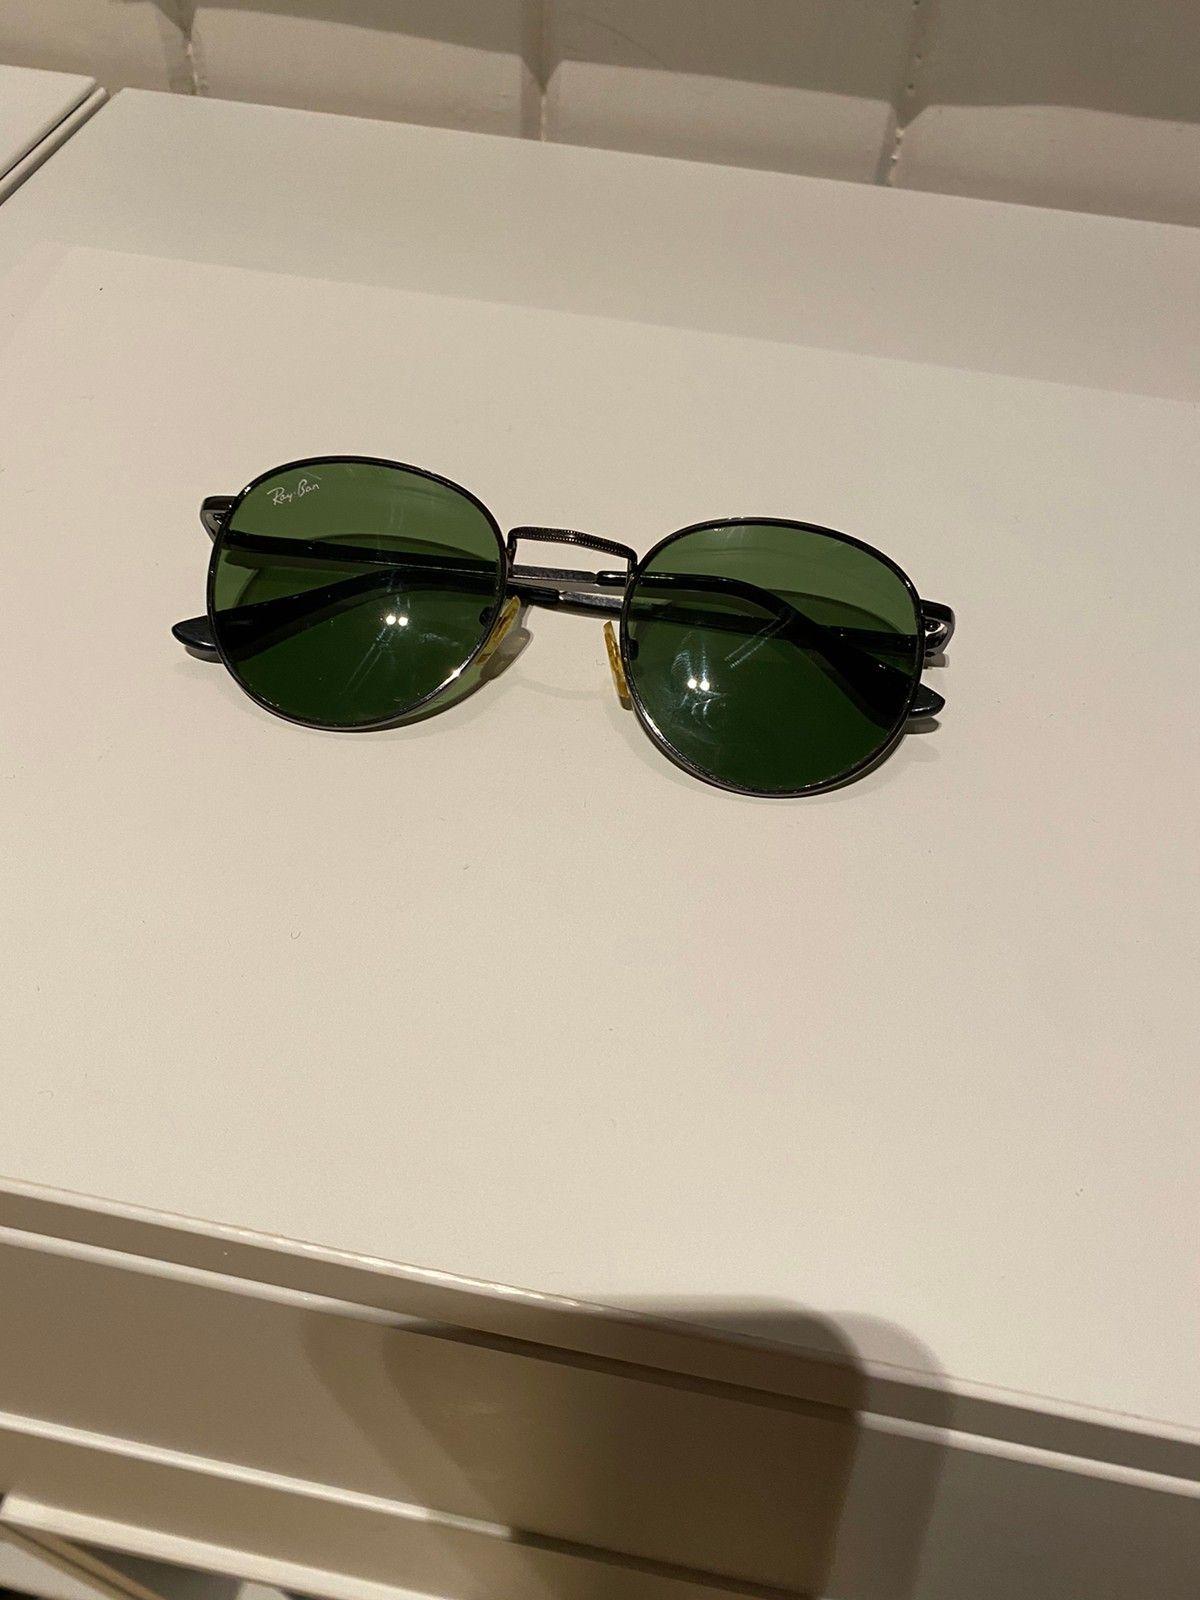 Runde RayBan briller | FINN.no